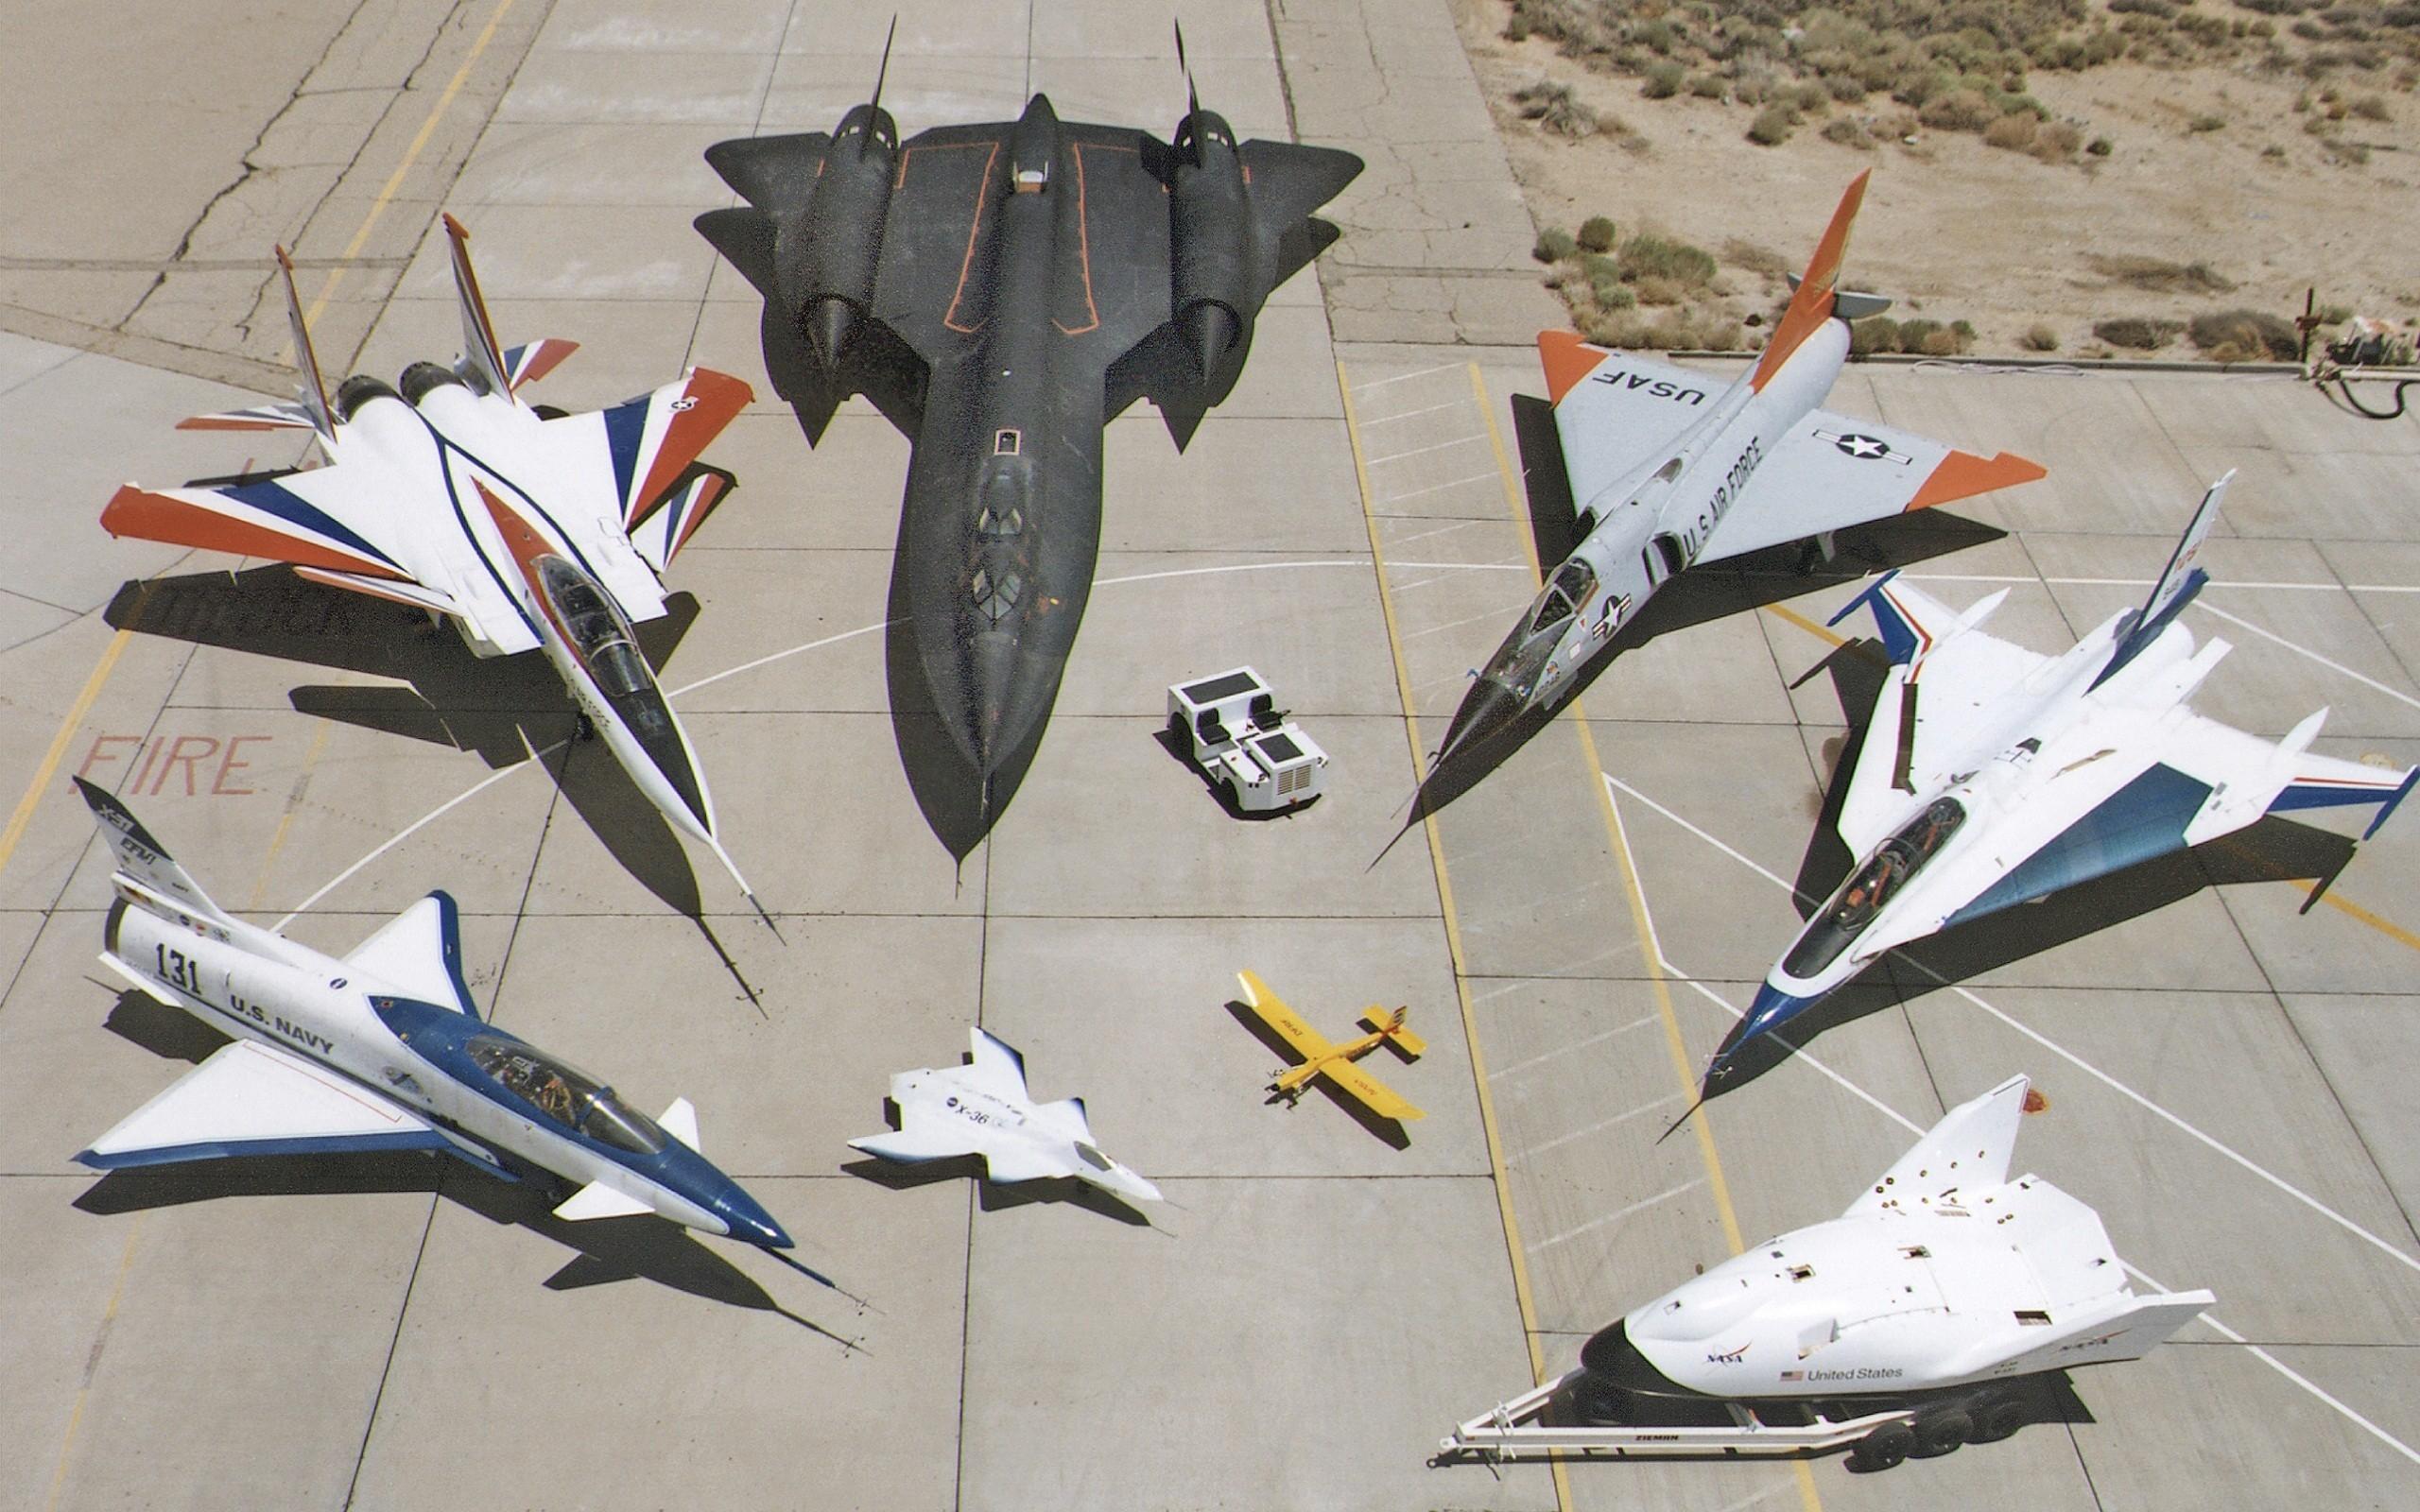 Aircraft nasa sr-71 blackbird aviation air force ...